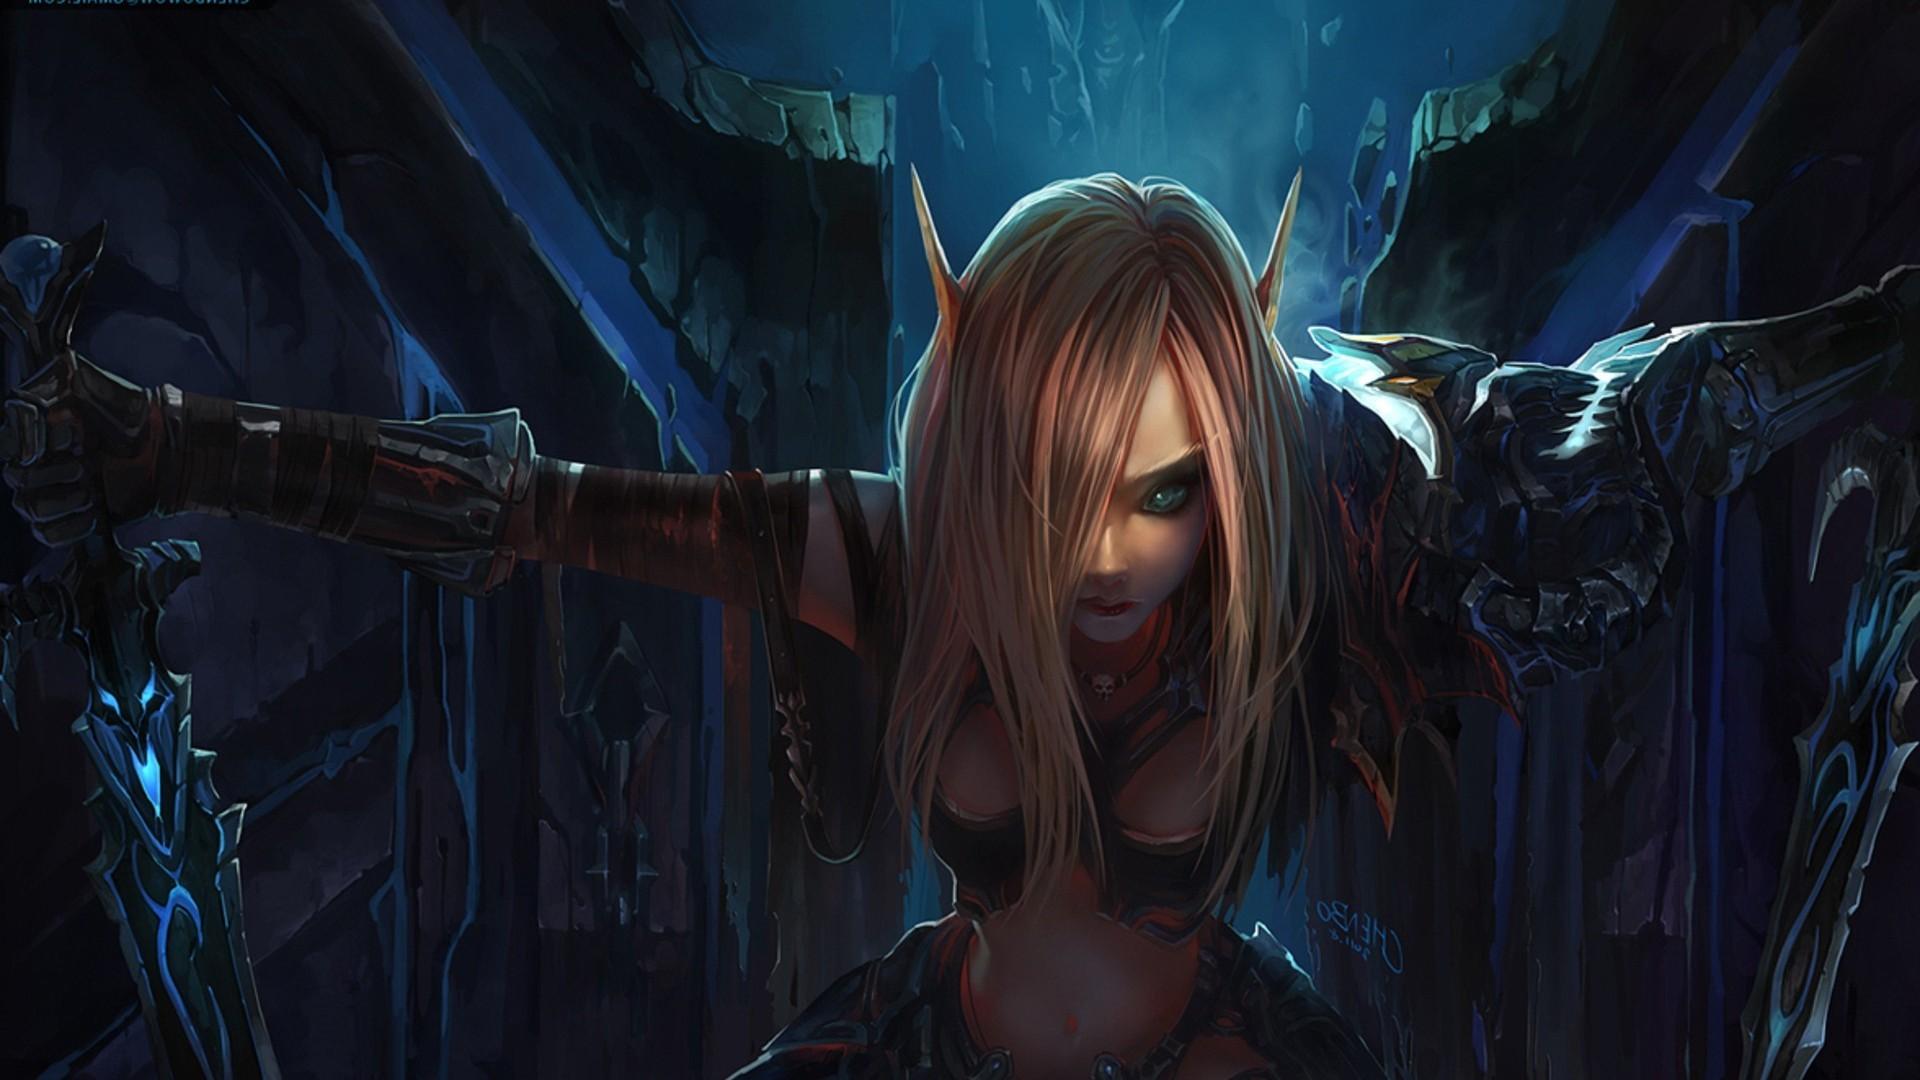 Galeria - World of Warcraft (wow)